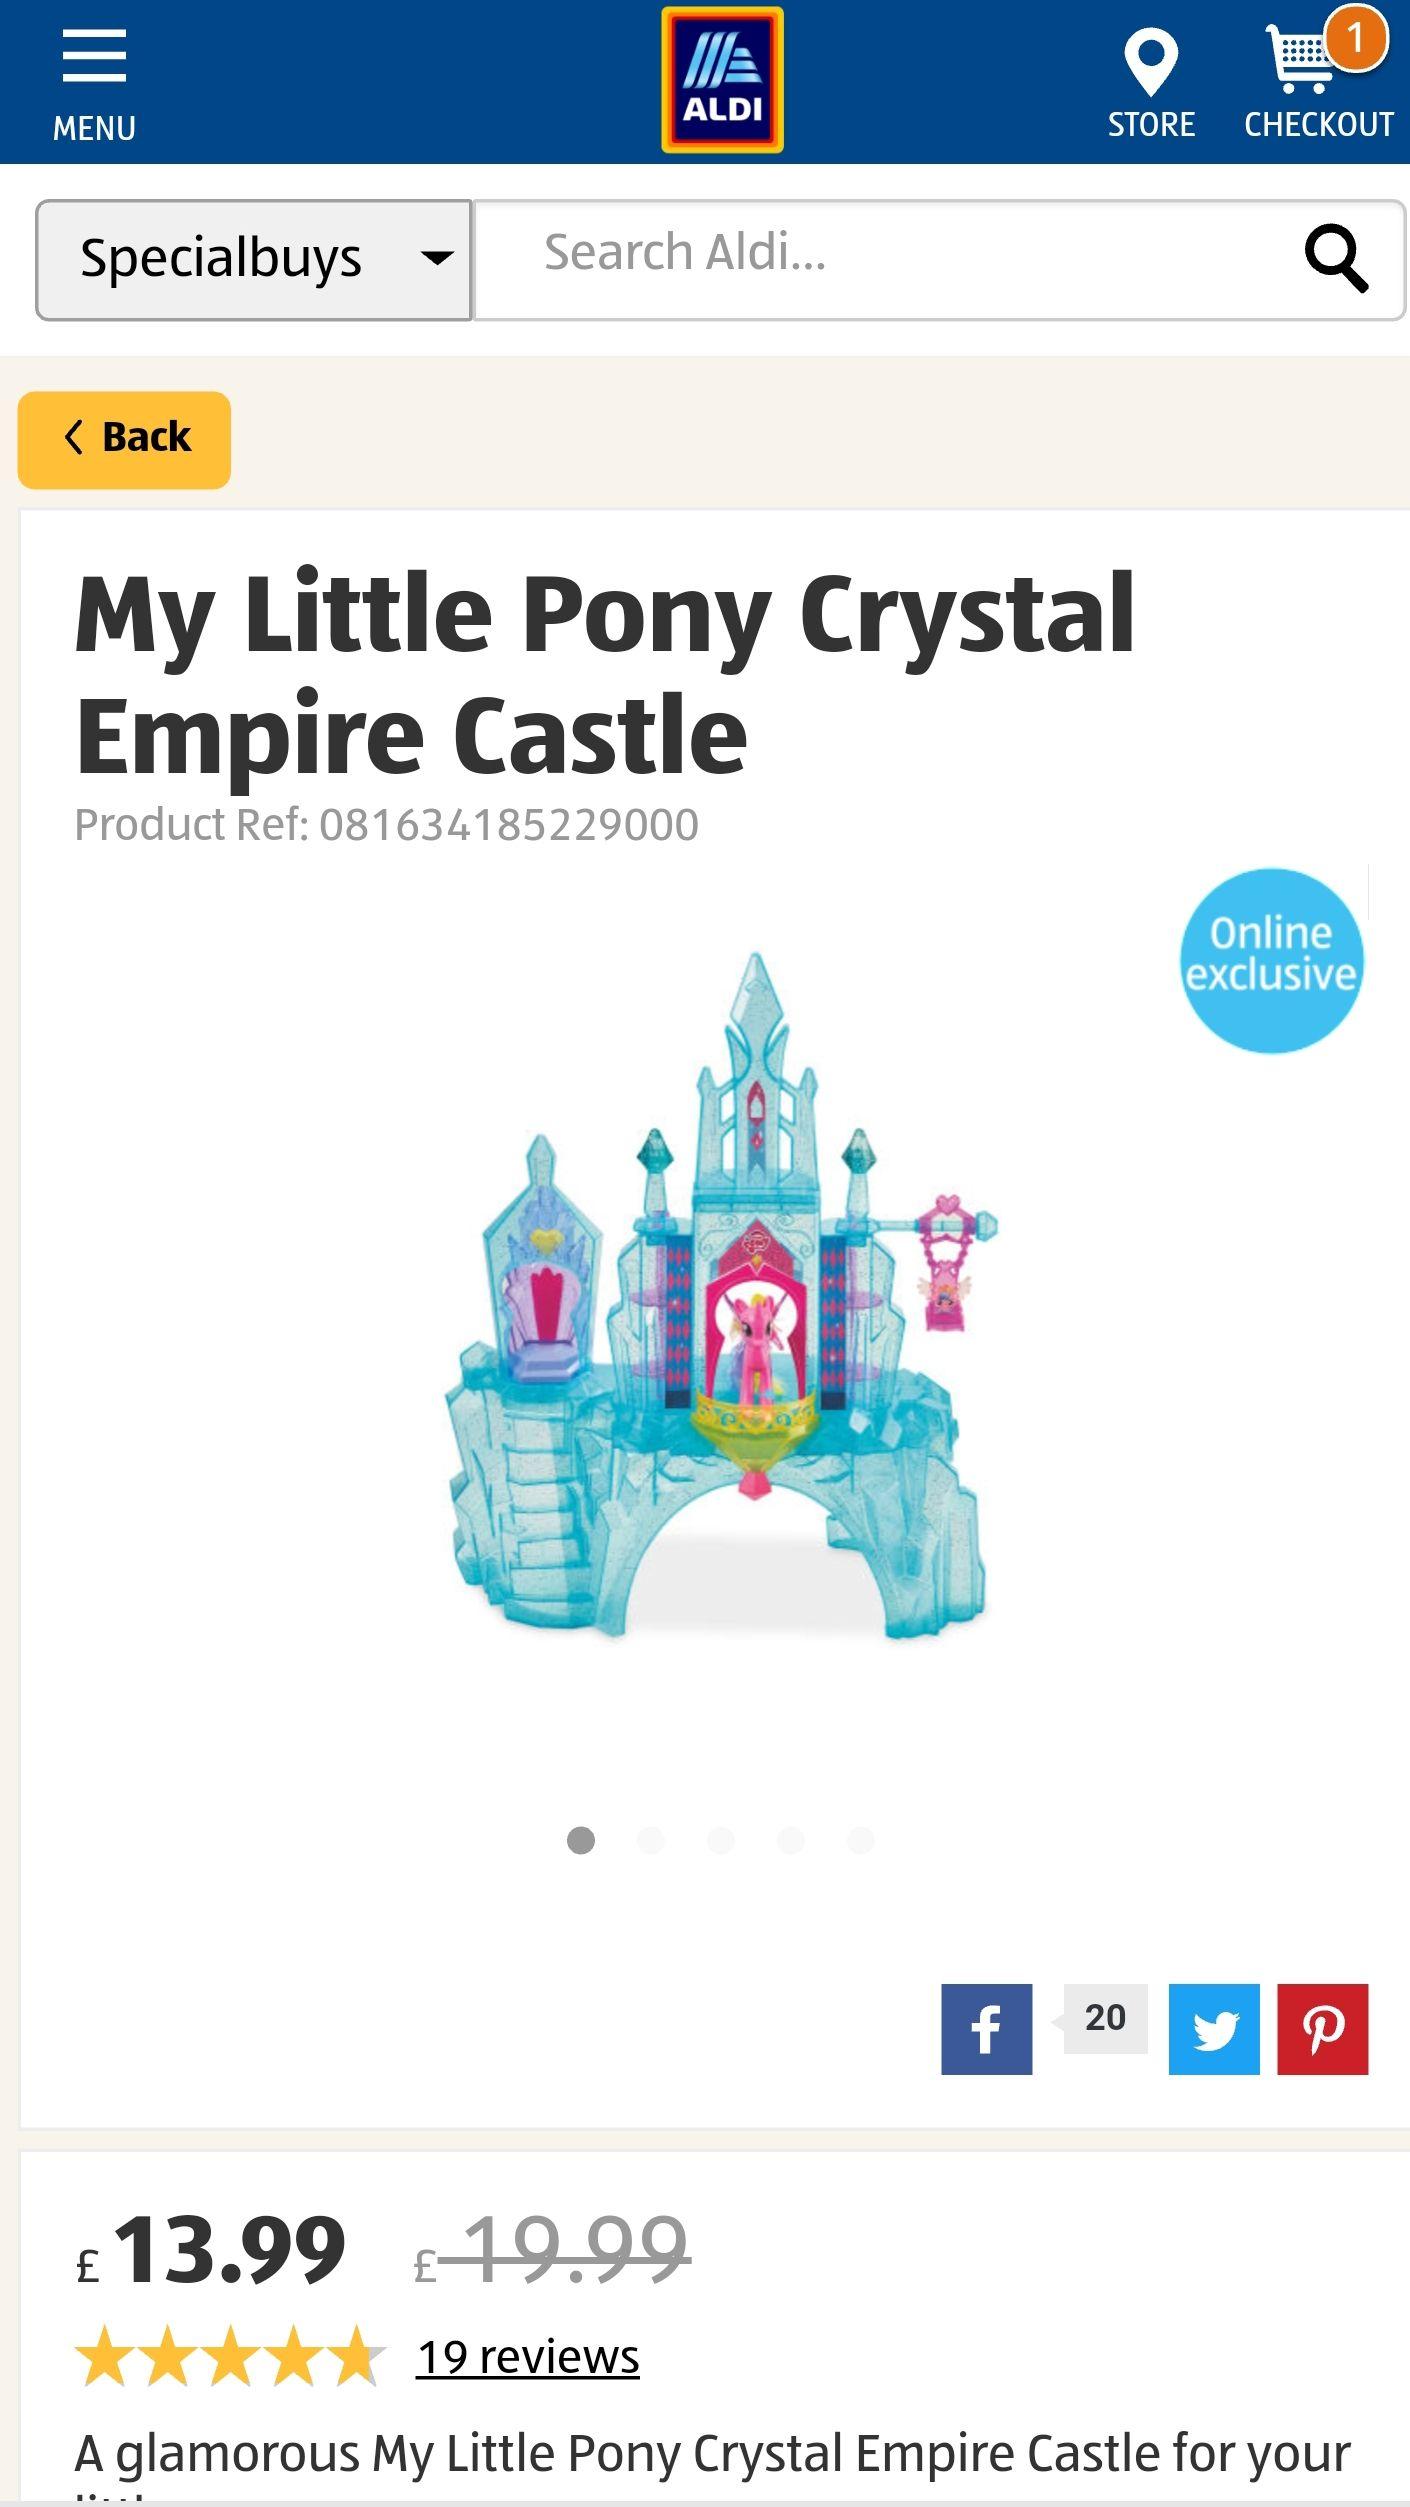 My little pony crystal empire castle - £16.94 @ Aldi